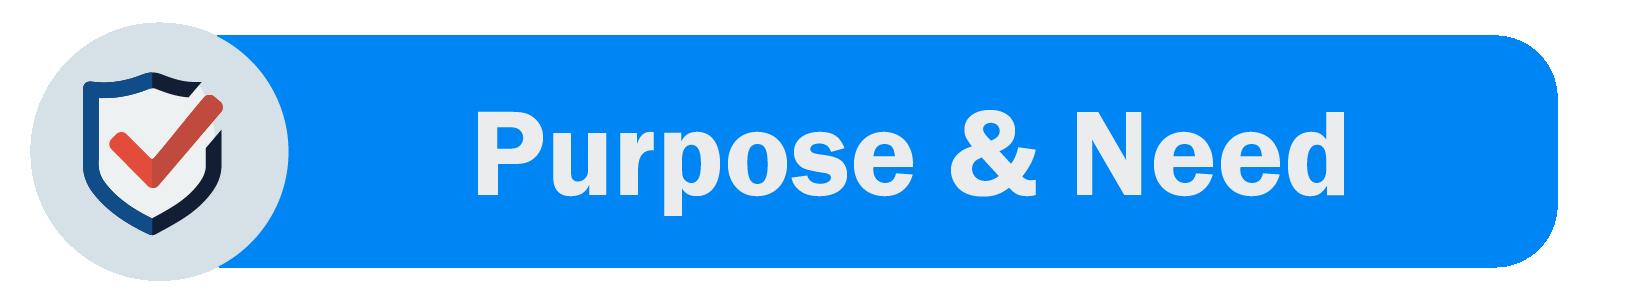 Purpose & Need Statement